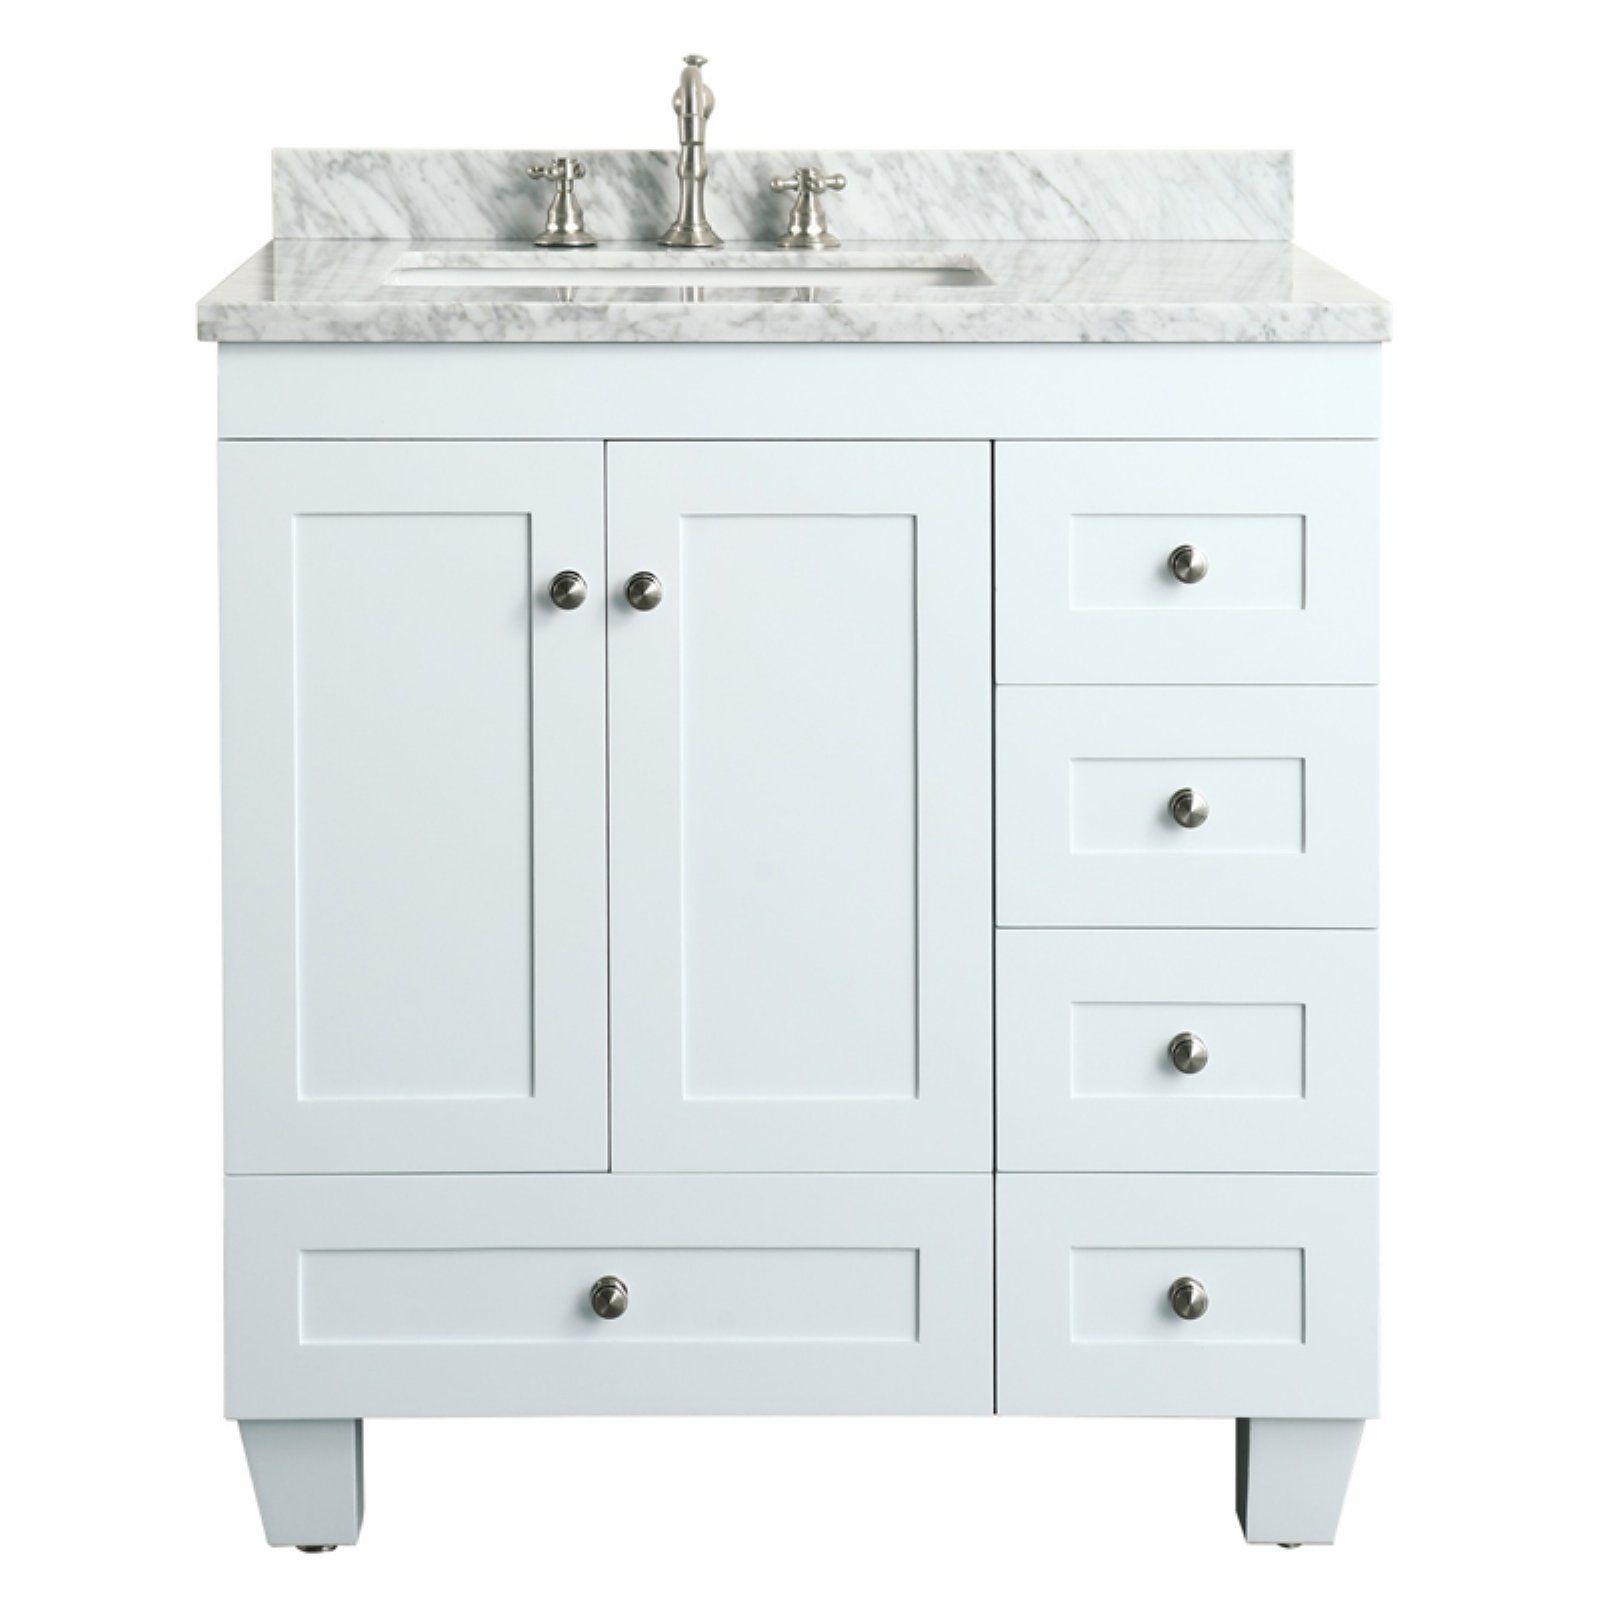 Eviva Acclaim 30 In Single Bathroom Vanity Set White Vanity